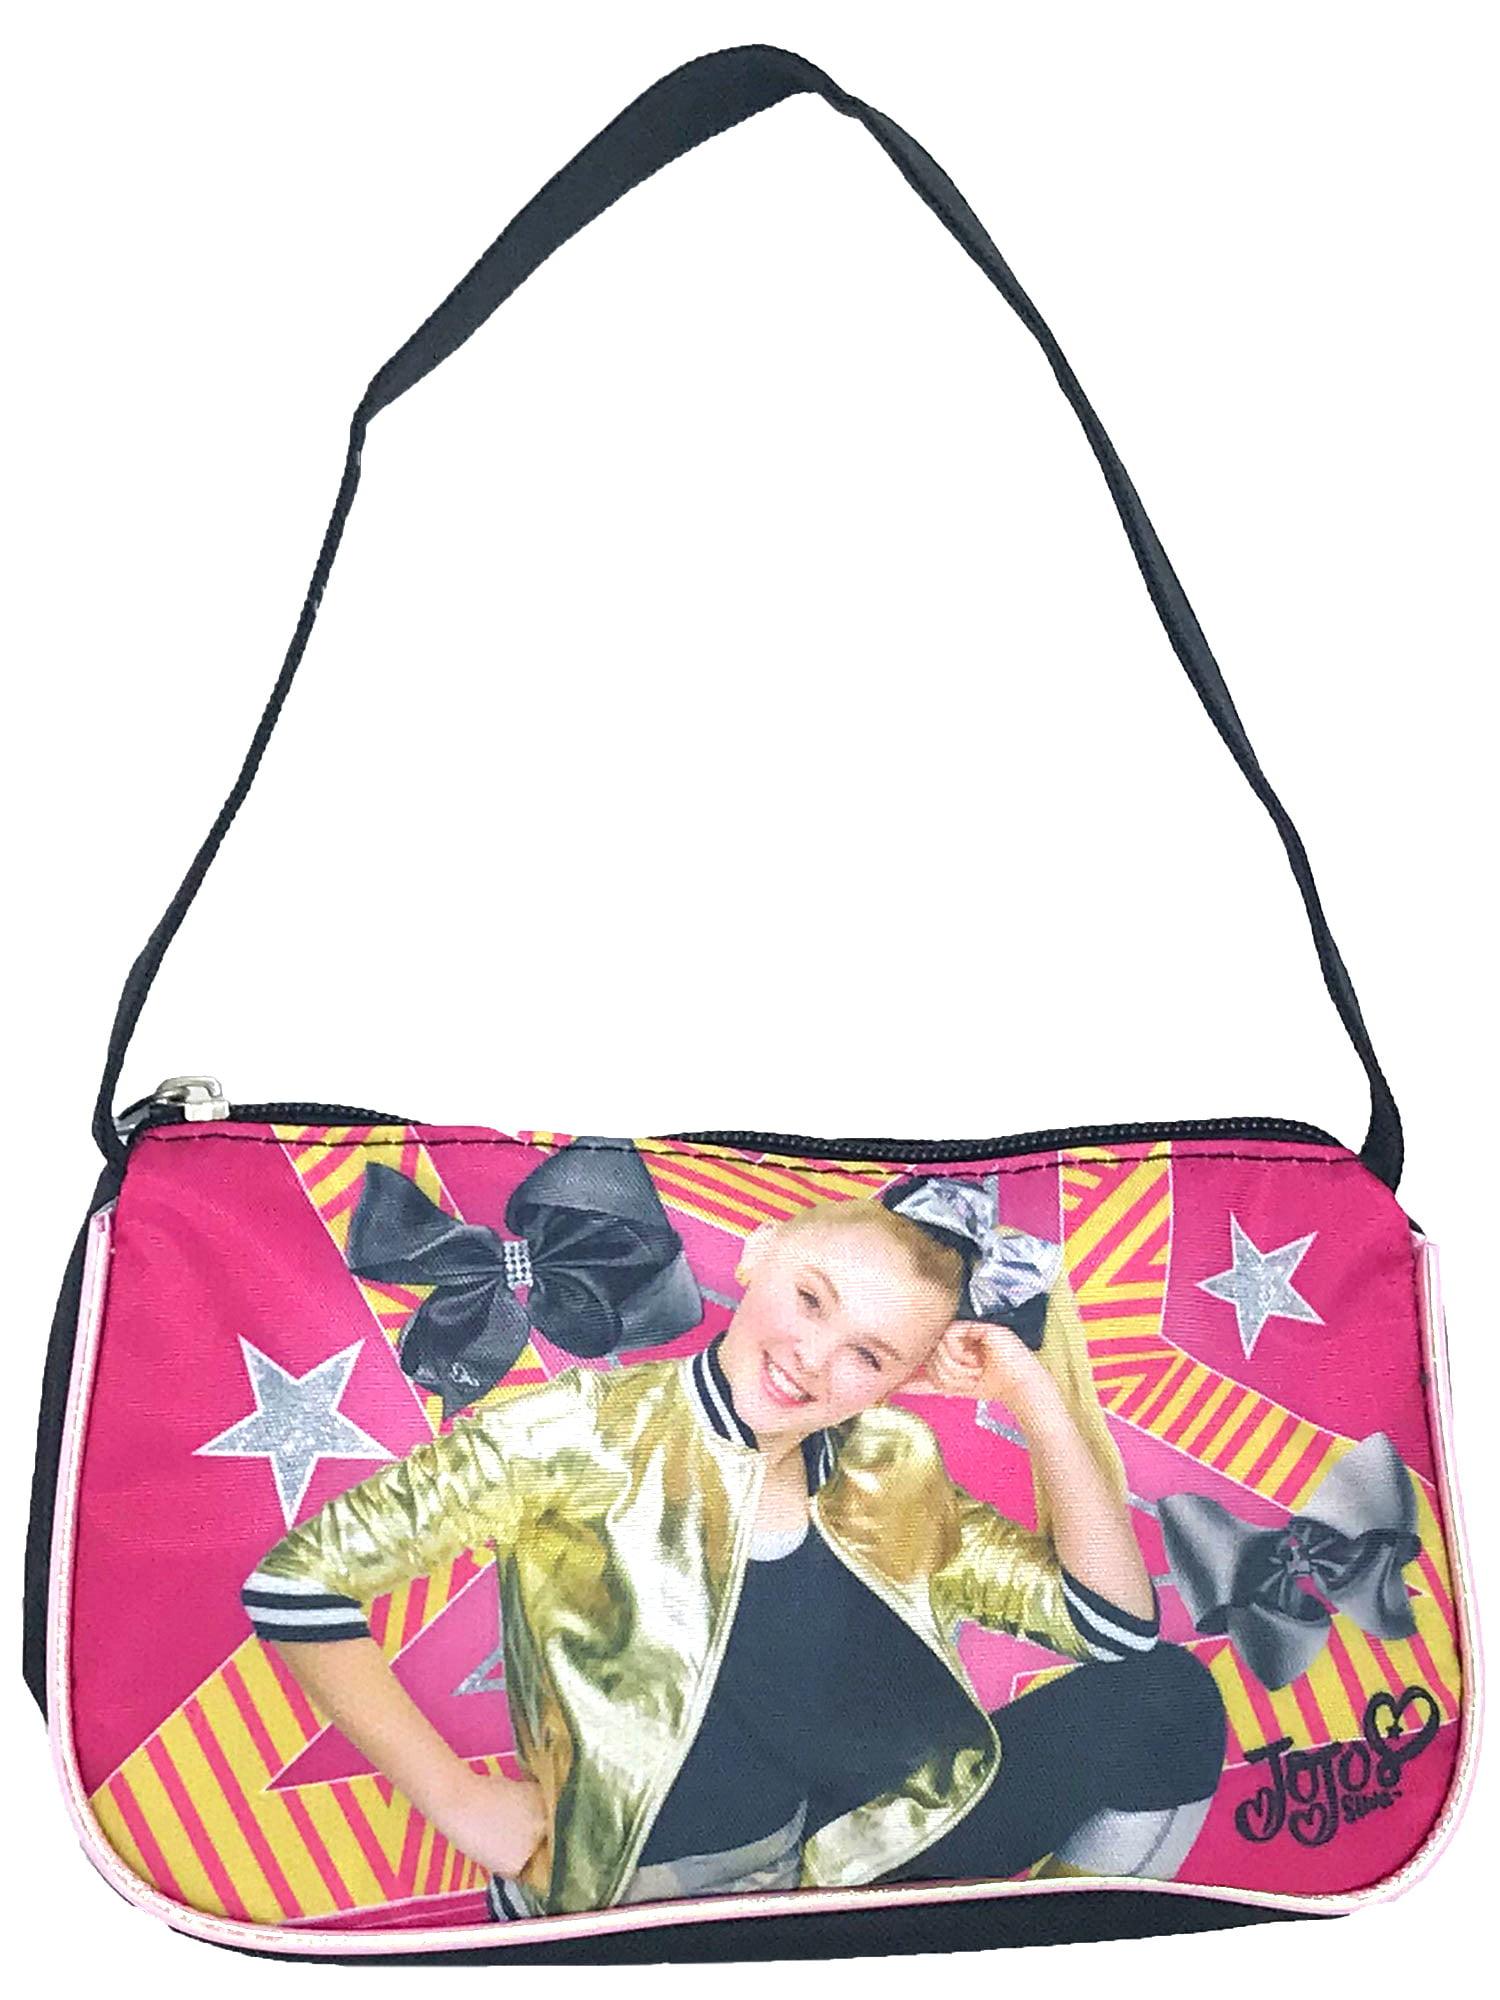 Girls JoJo Siwa Handbag Small  Purse Shoulder Strap